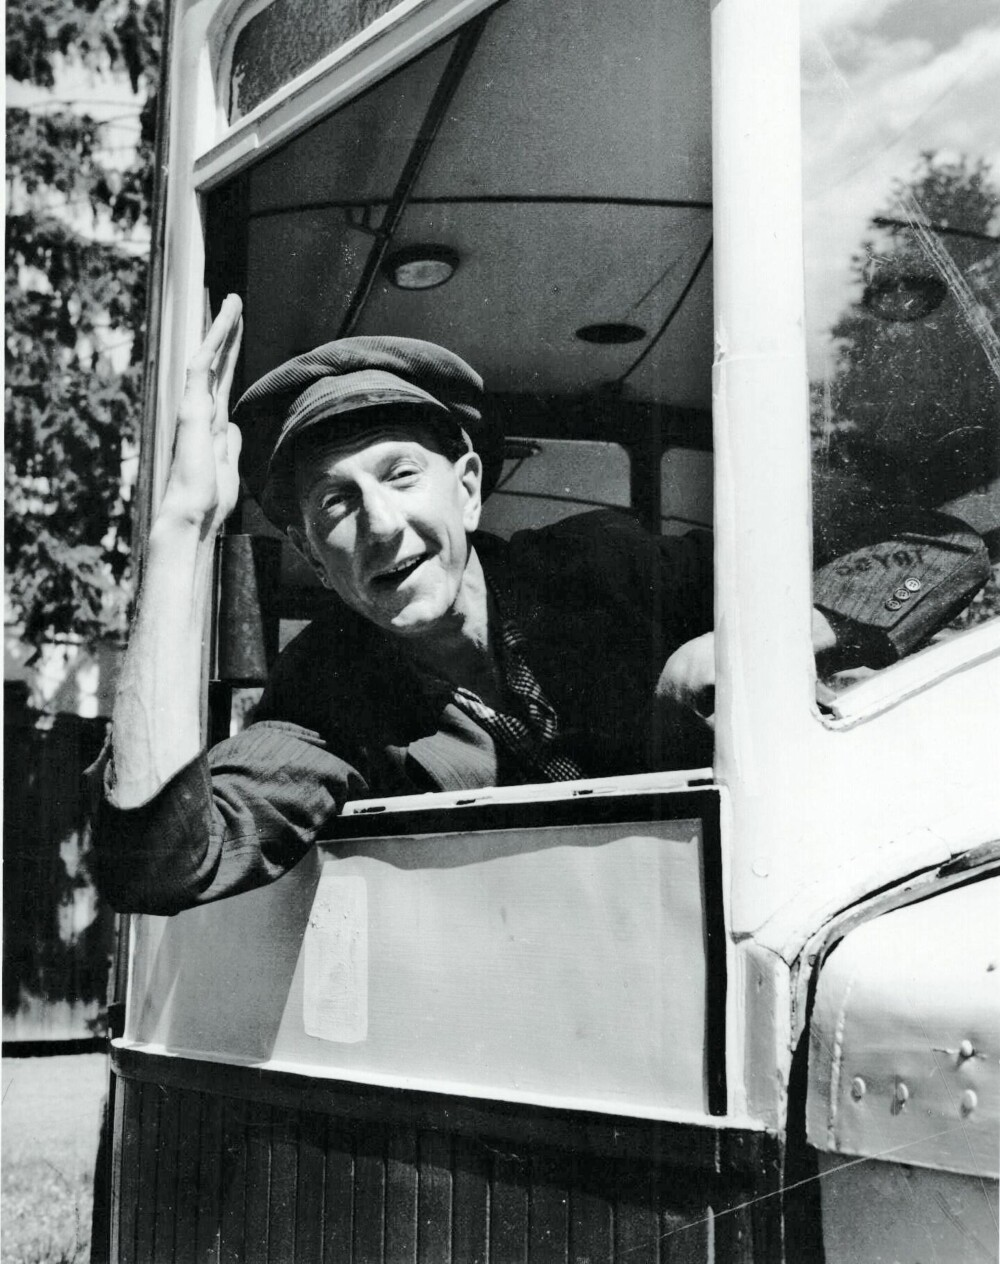 KLASSIKER: Som bussjåføren Thorvald gjorde Juster suksess i filmen «Bussen» i 1961. Andre klassikere er «Fjols til fjells» (1957) og «Den forsvundne pølsemaker» (1941).